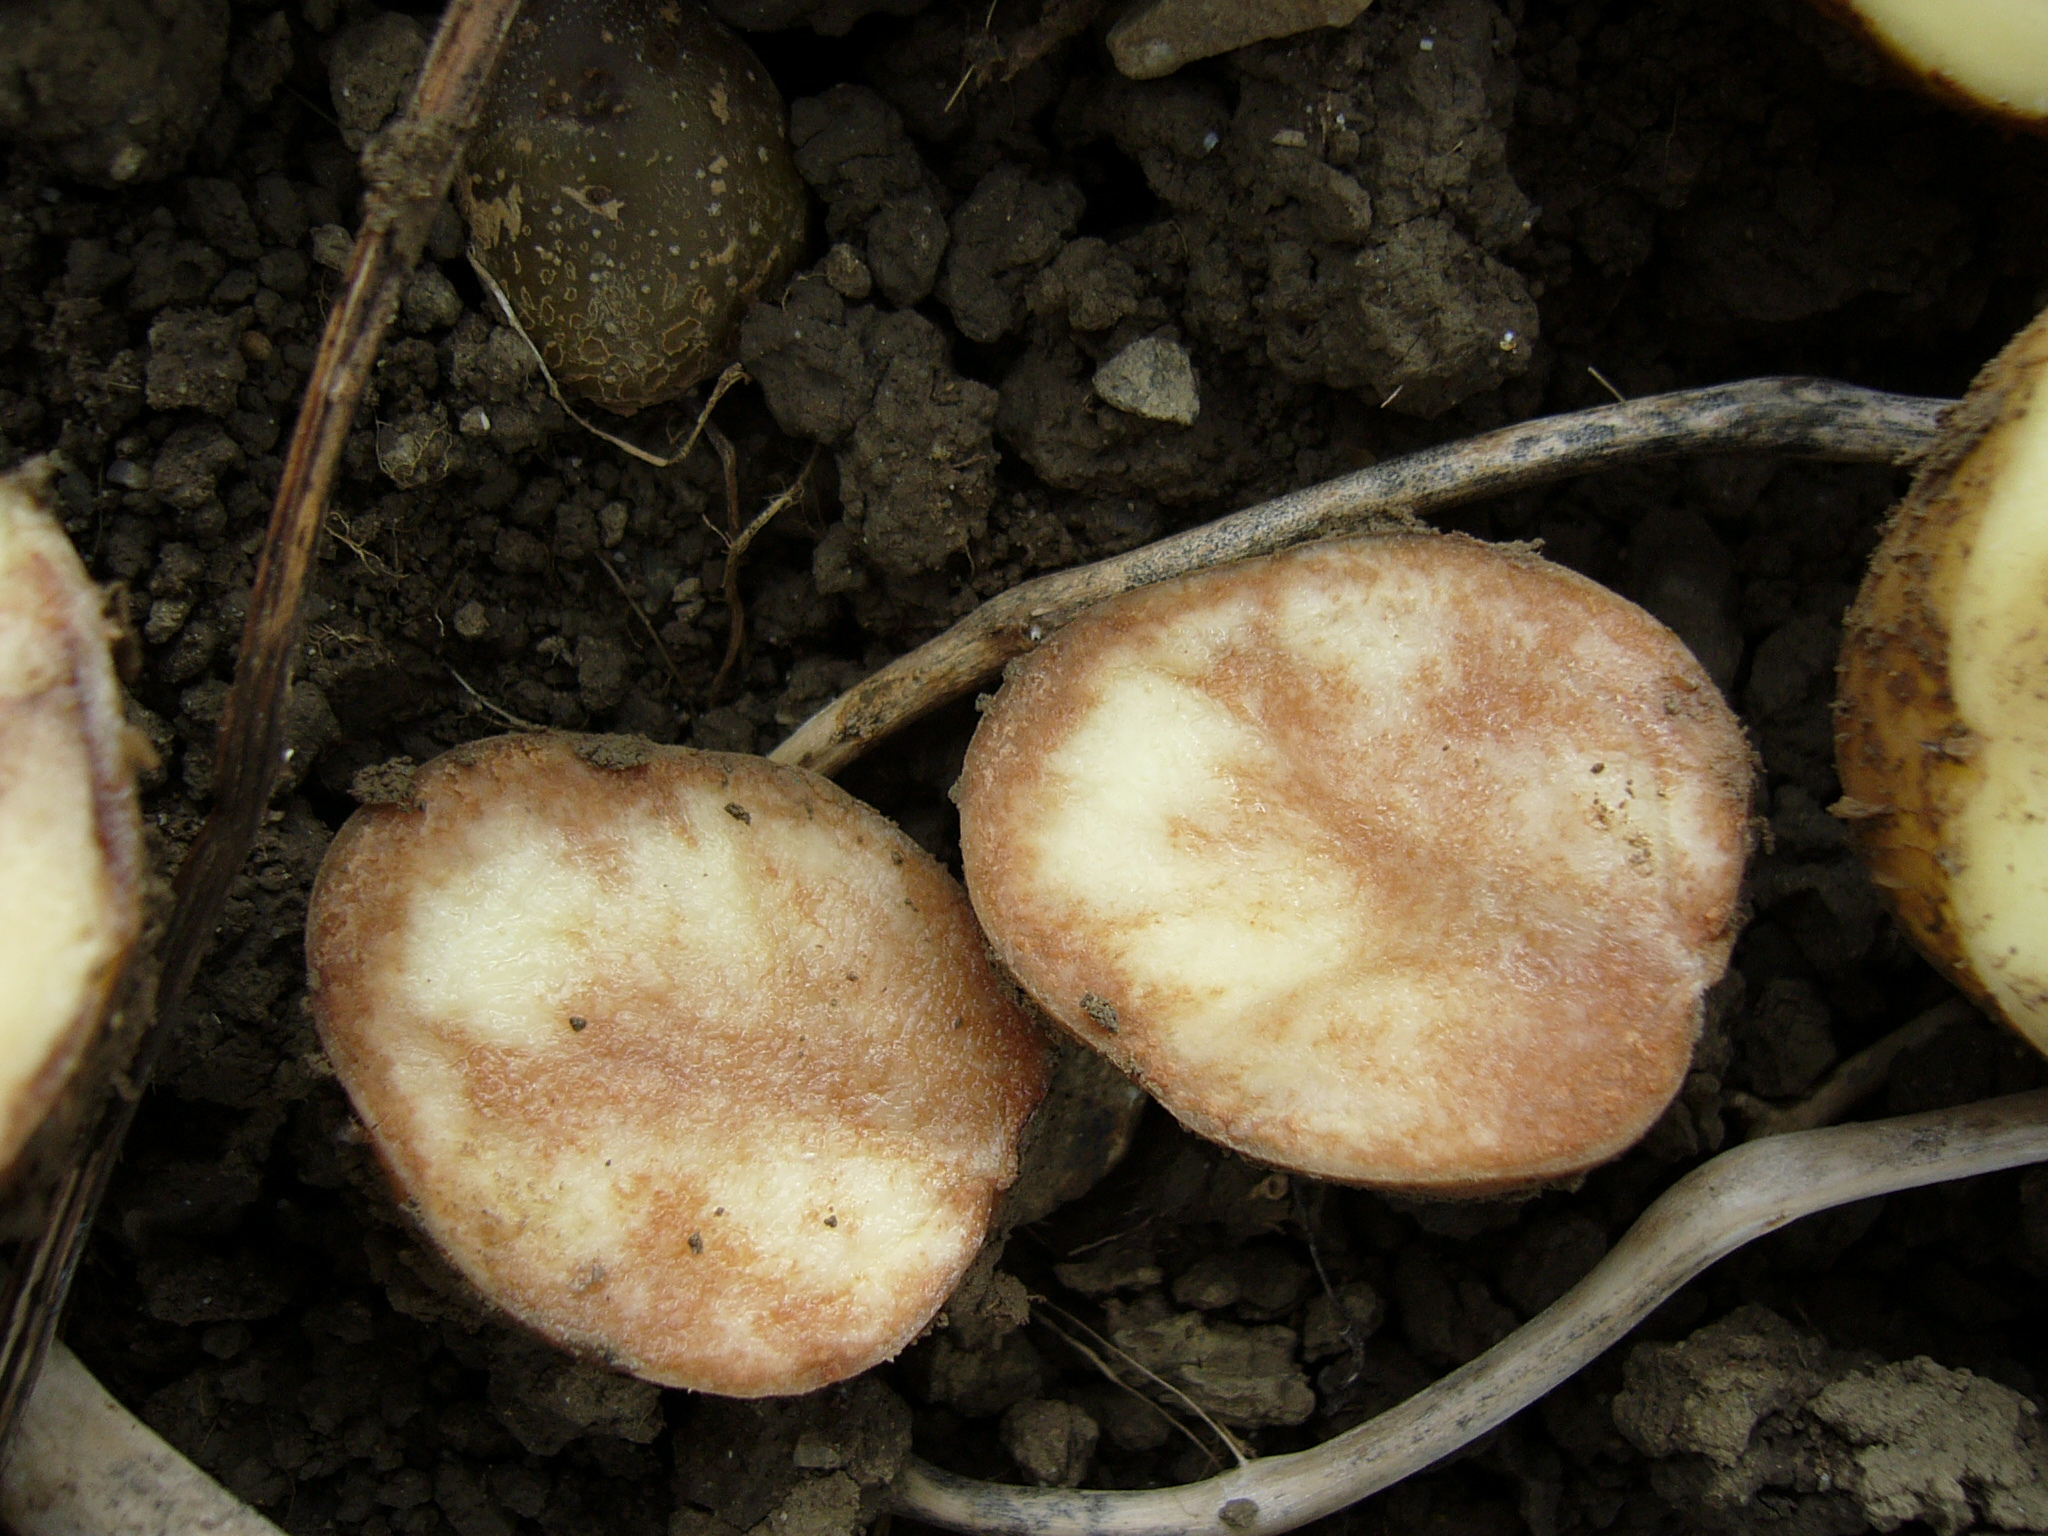 Kartoffeln Knollen-Braunfäule